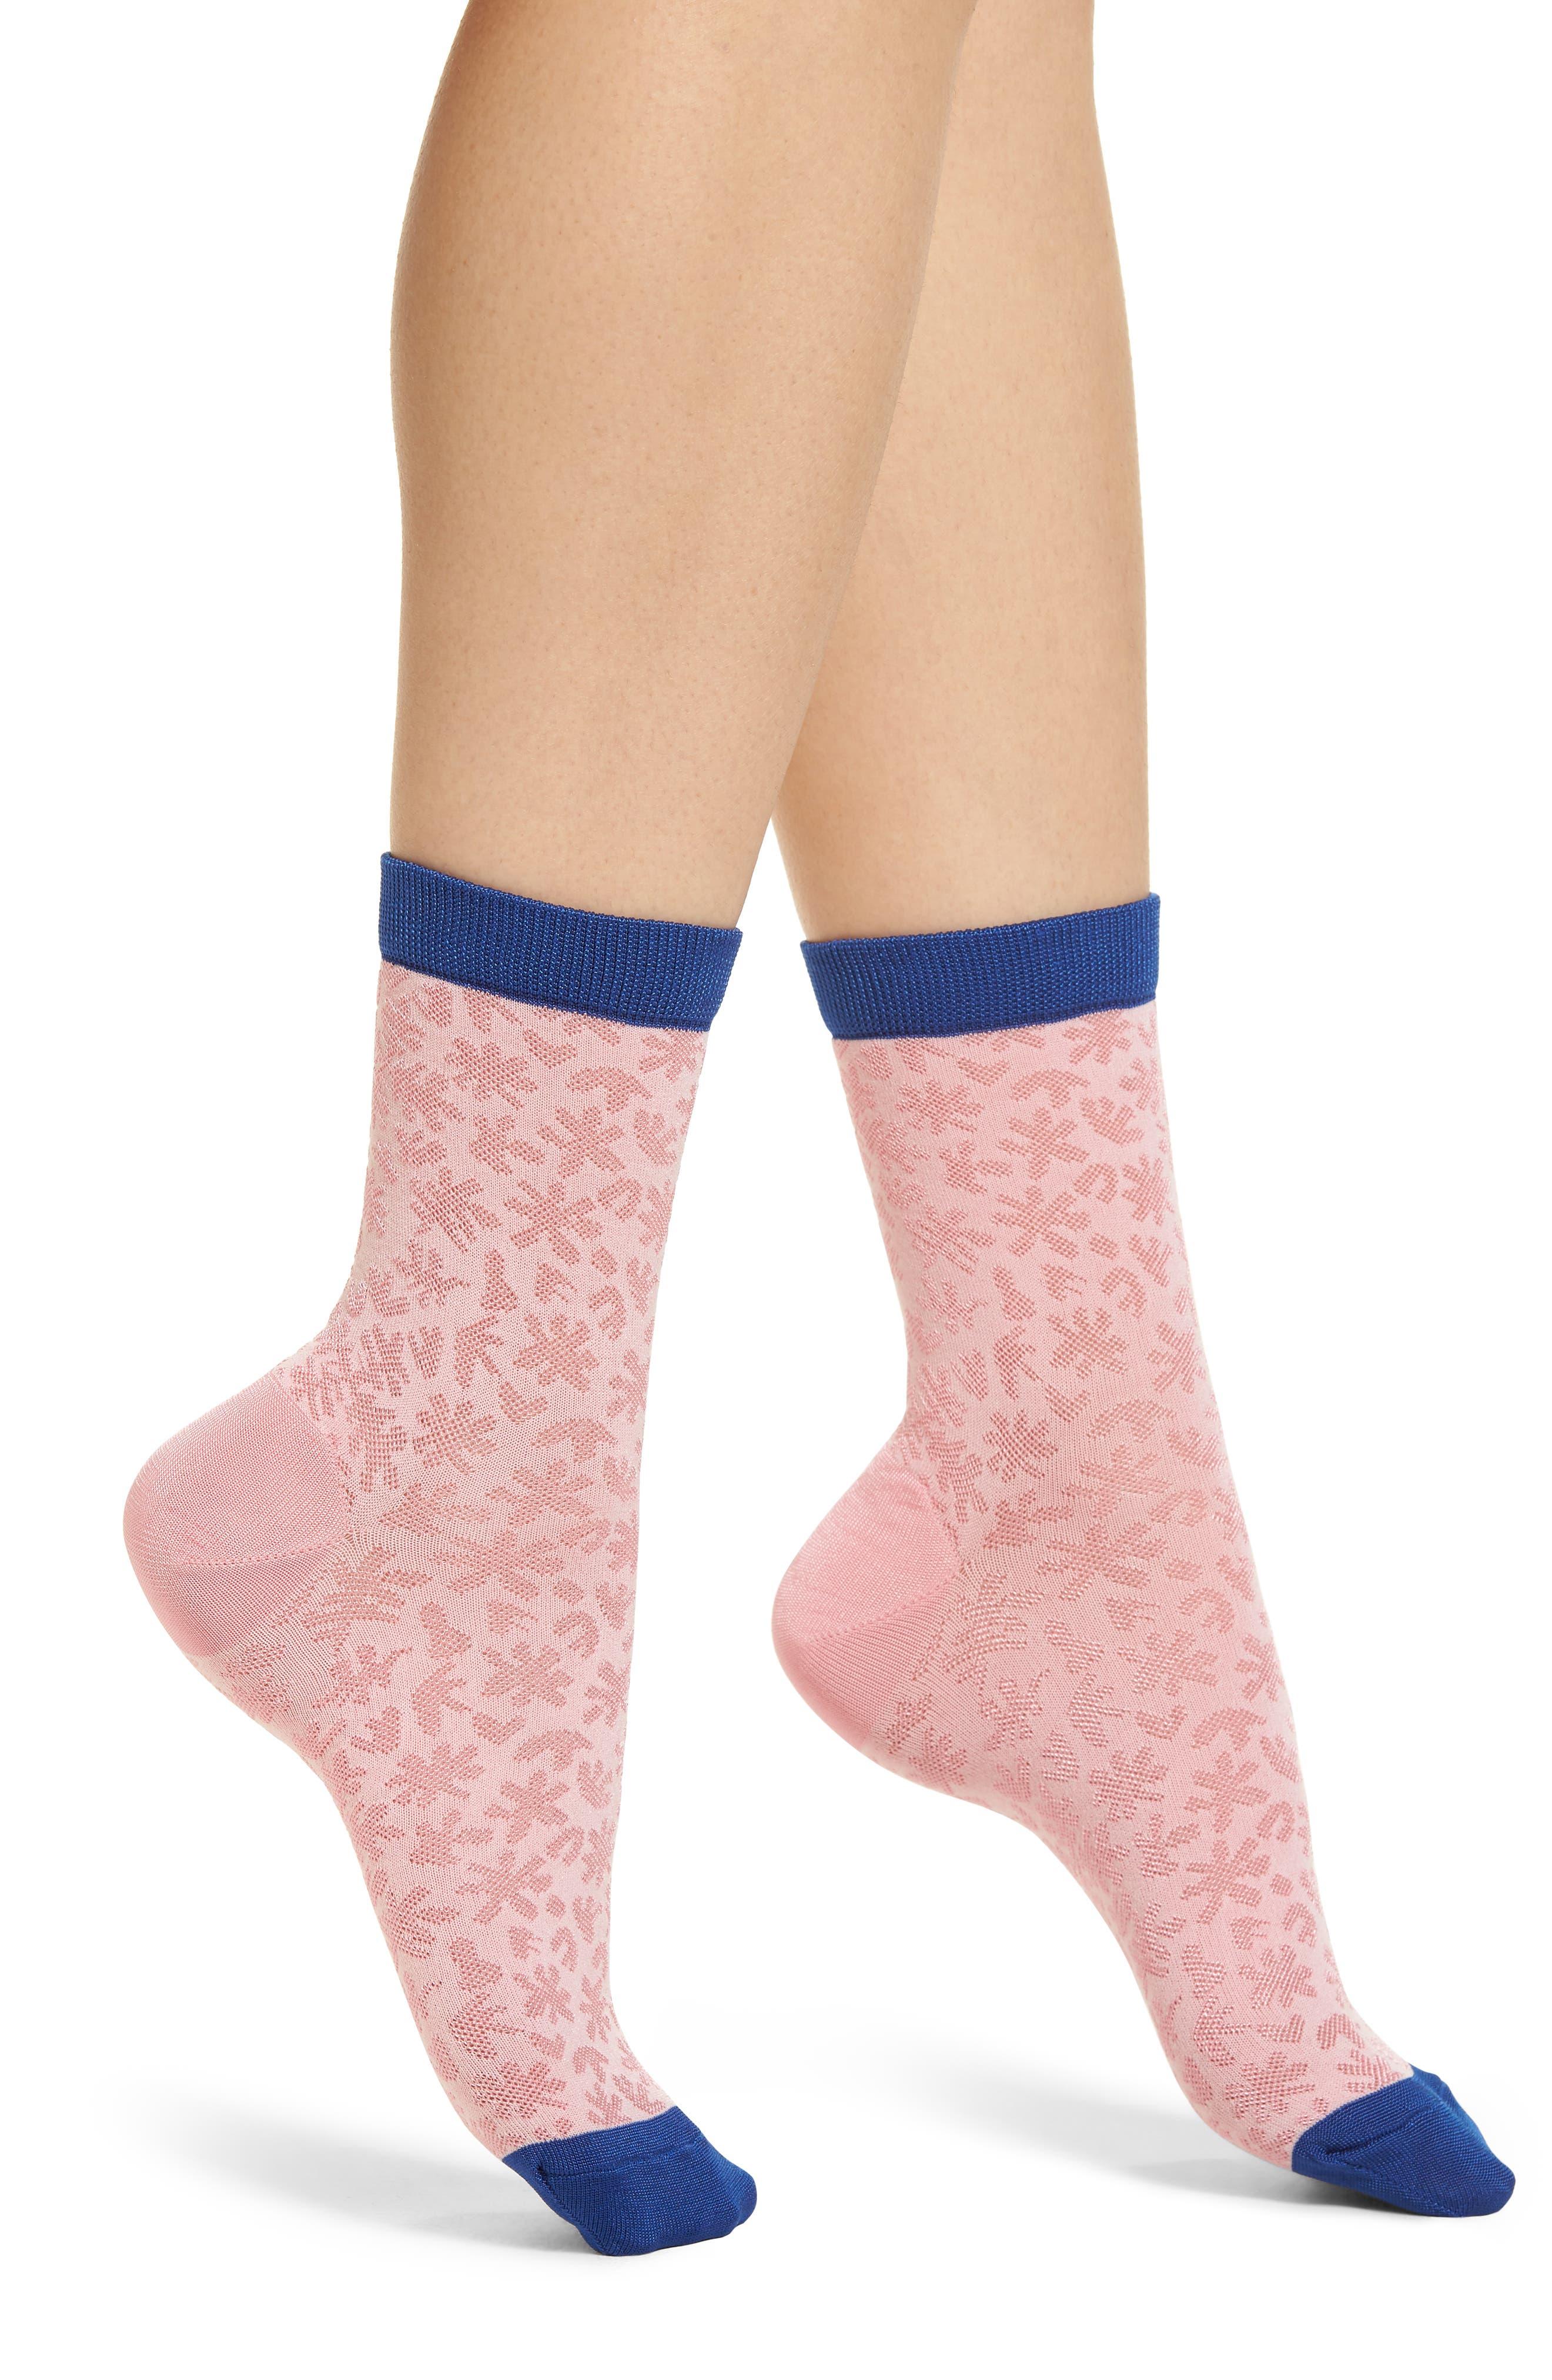 Lotta Ankle Socks,                         Main,                         color, 680